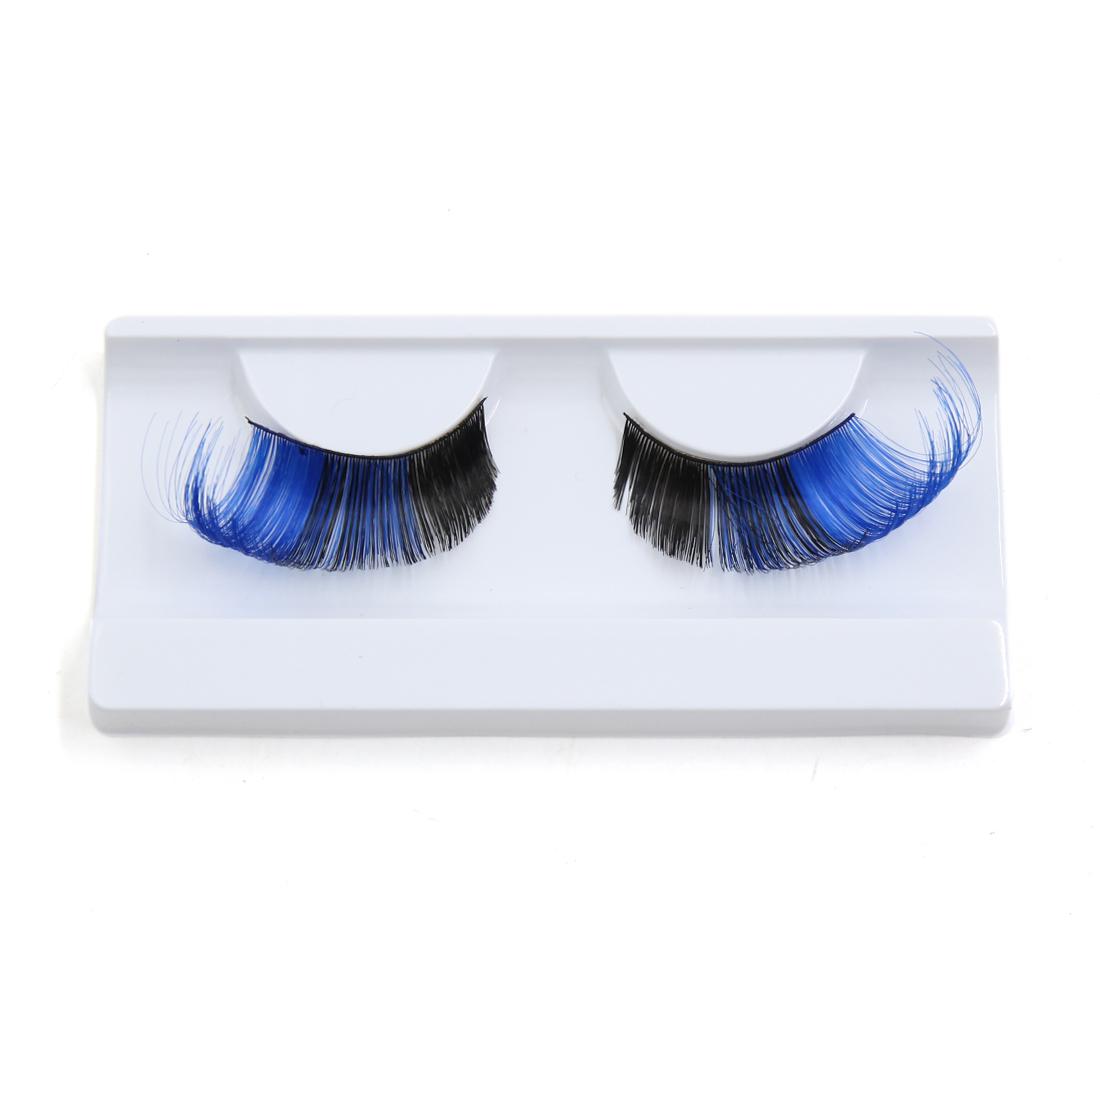 1 Pair Blue Black False Eyelashes Extension Eye Decor for Women Party Makeup